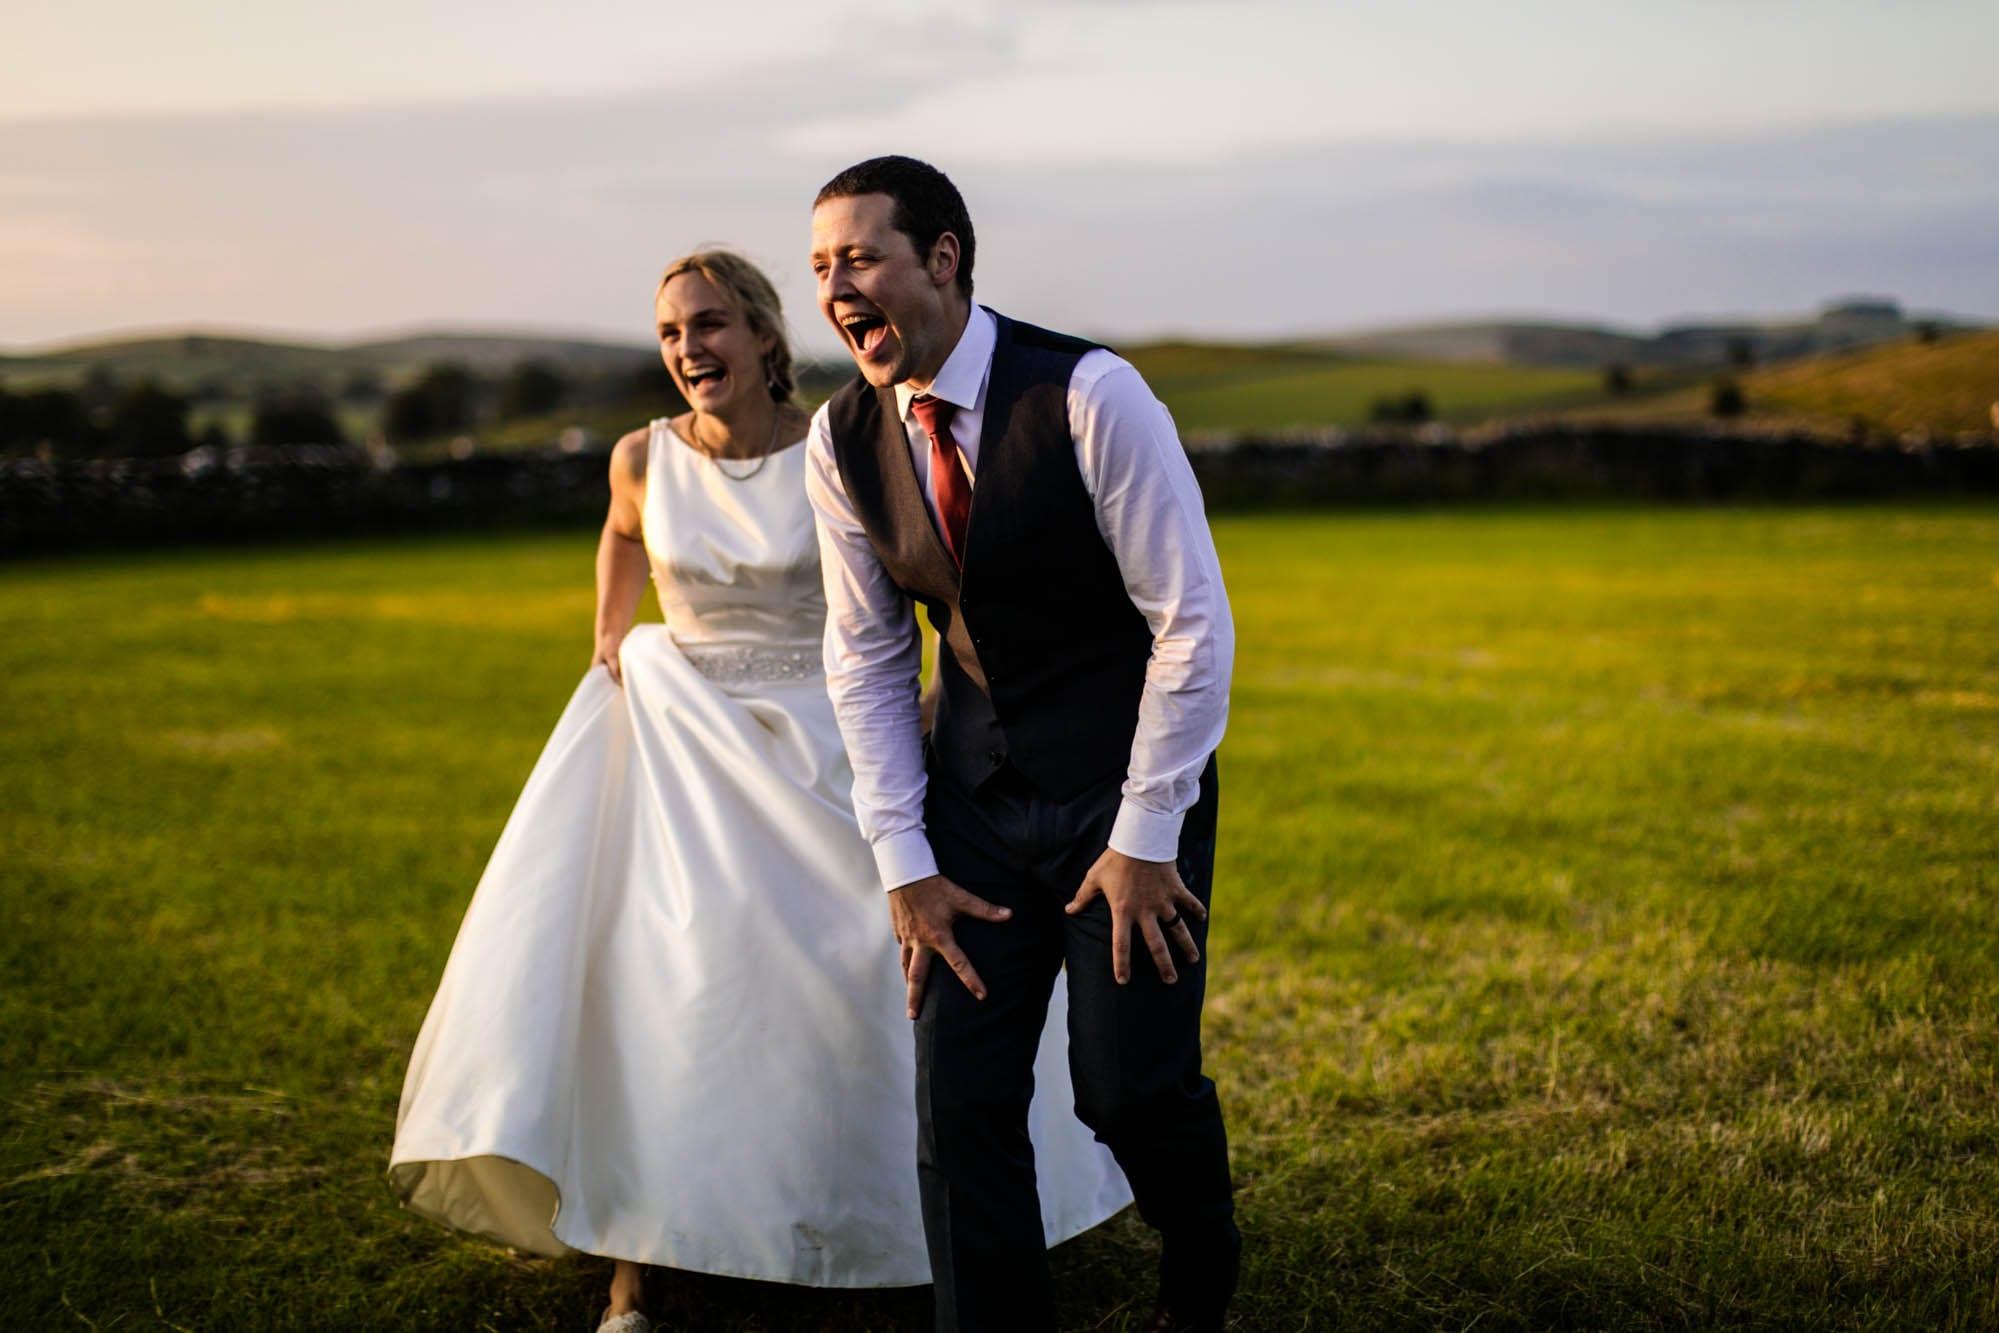 Lower Damgate Farm Creative Wedding Photography